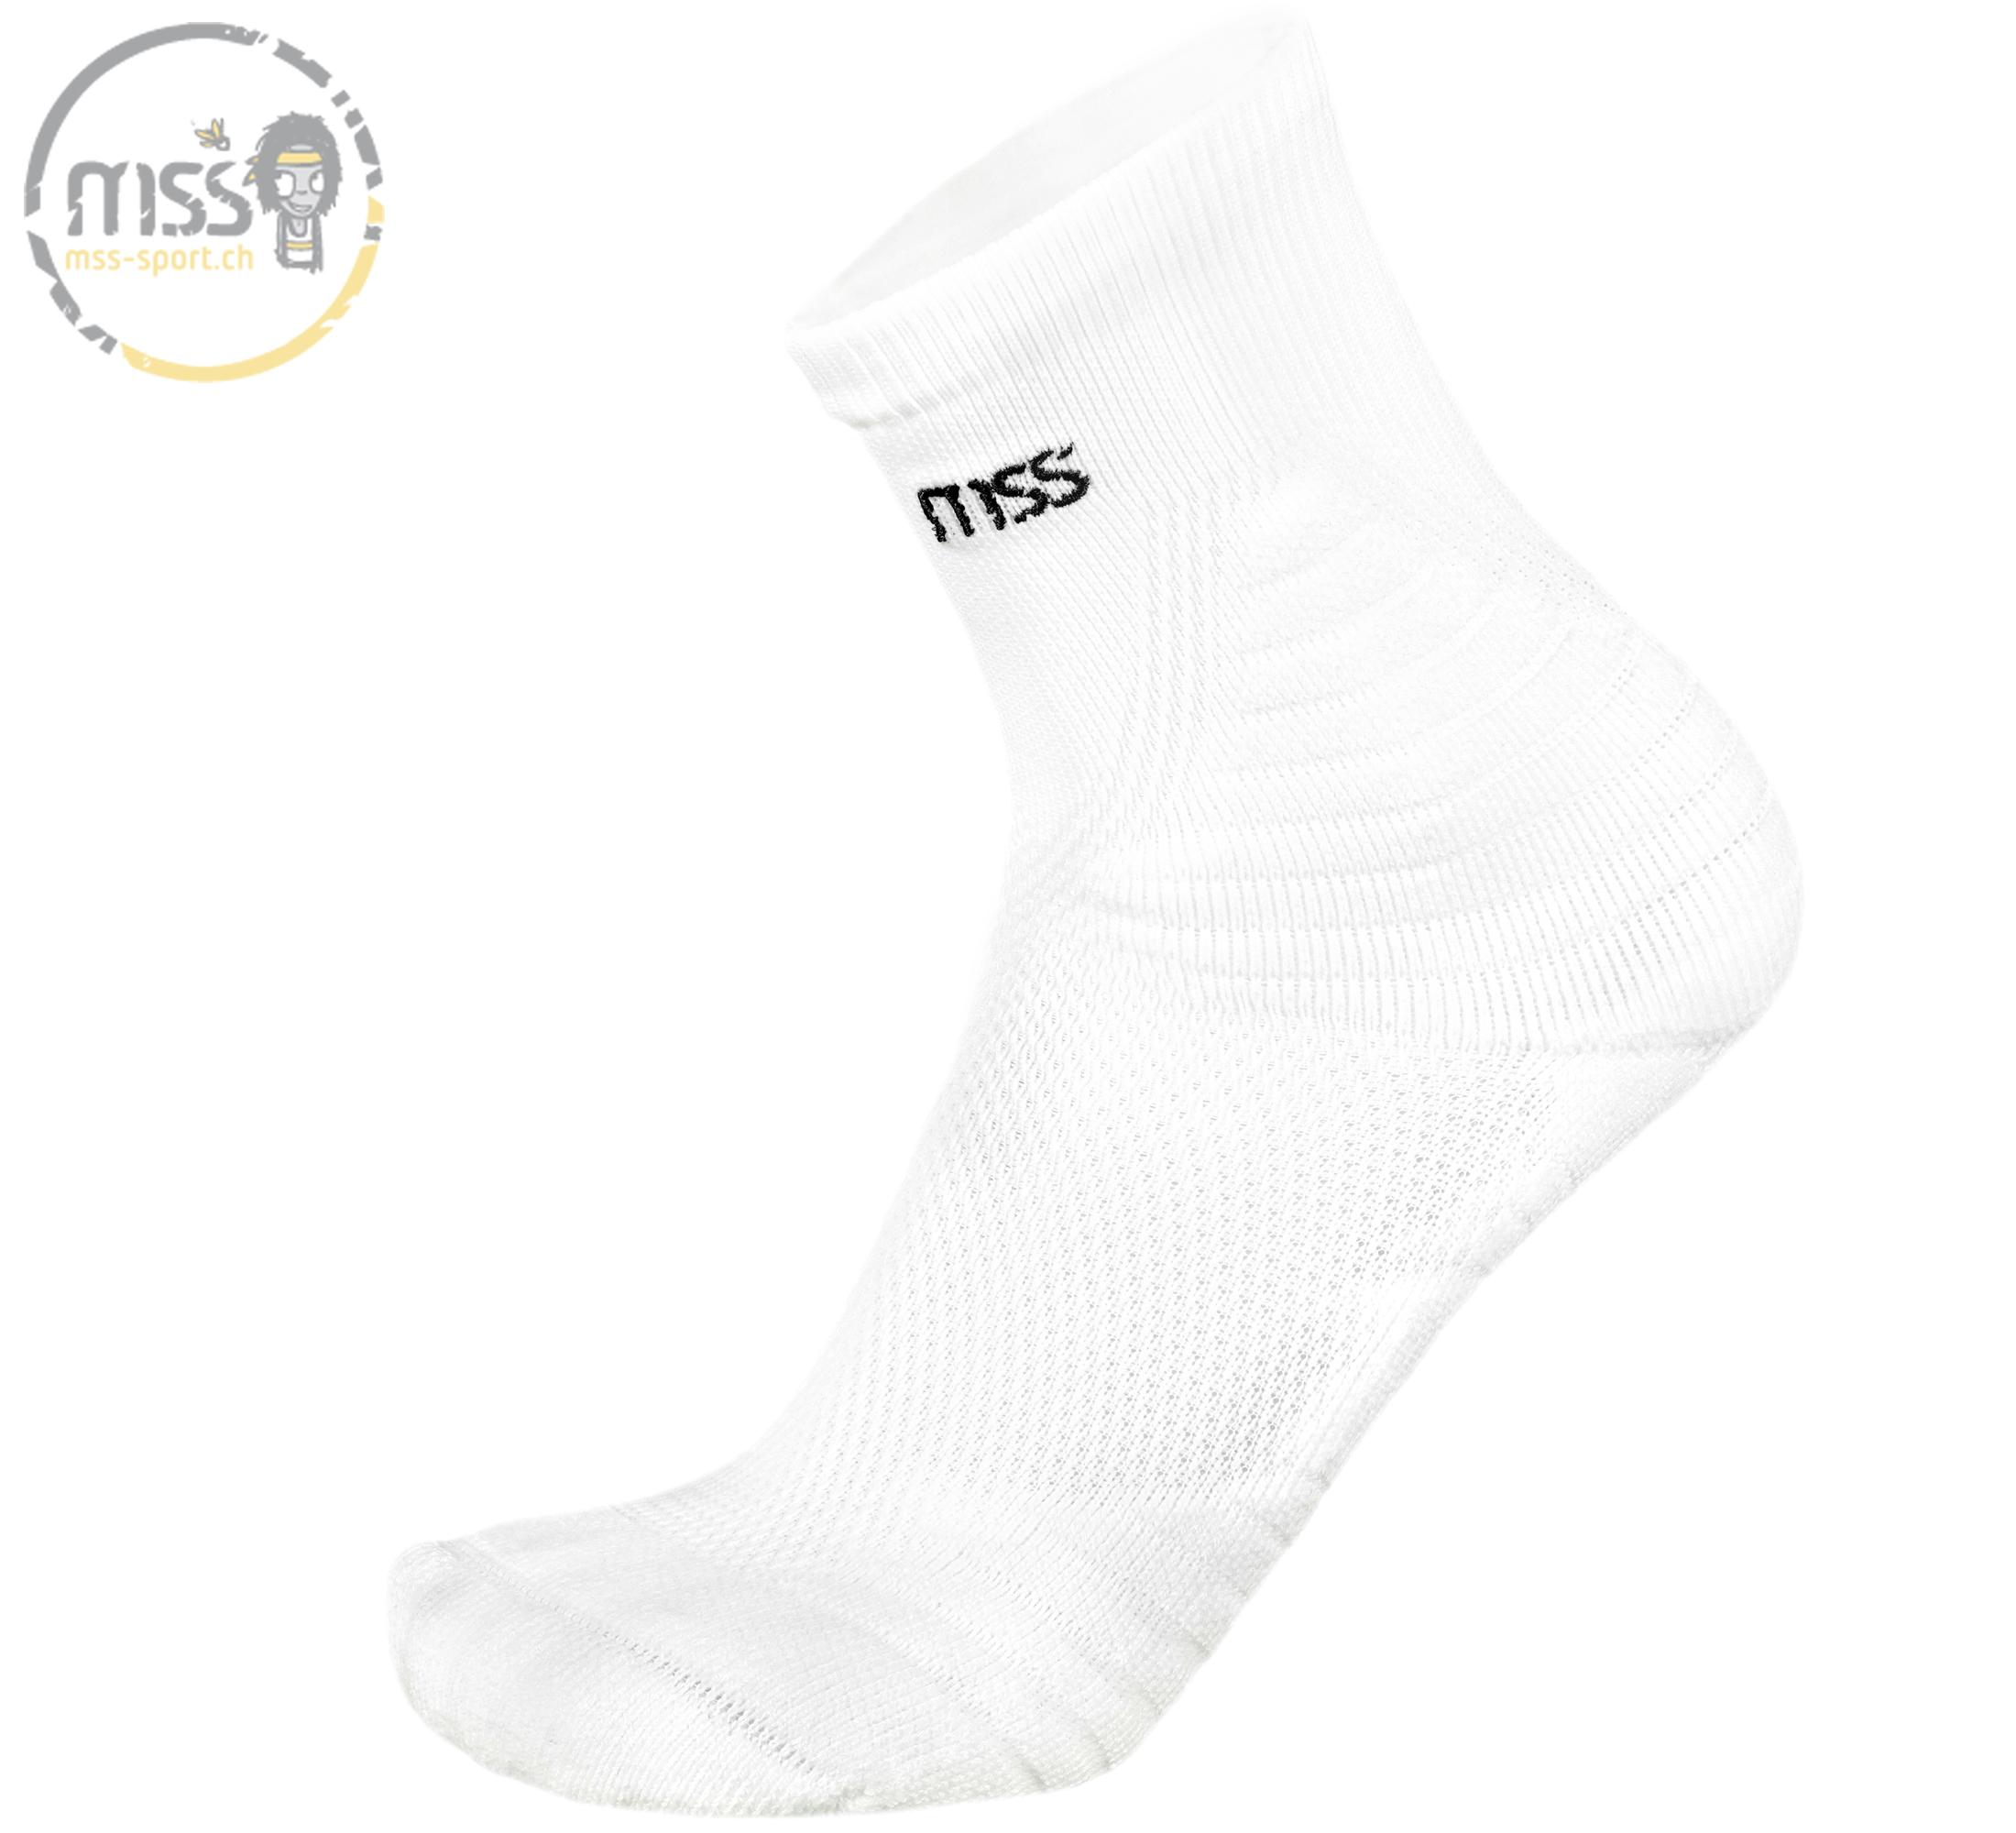 mss-socks Smash 5500 mid white